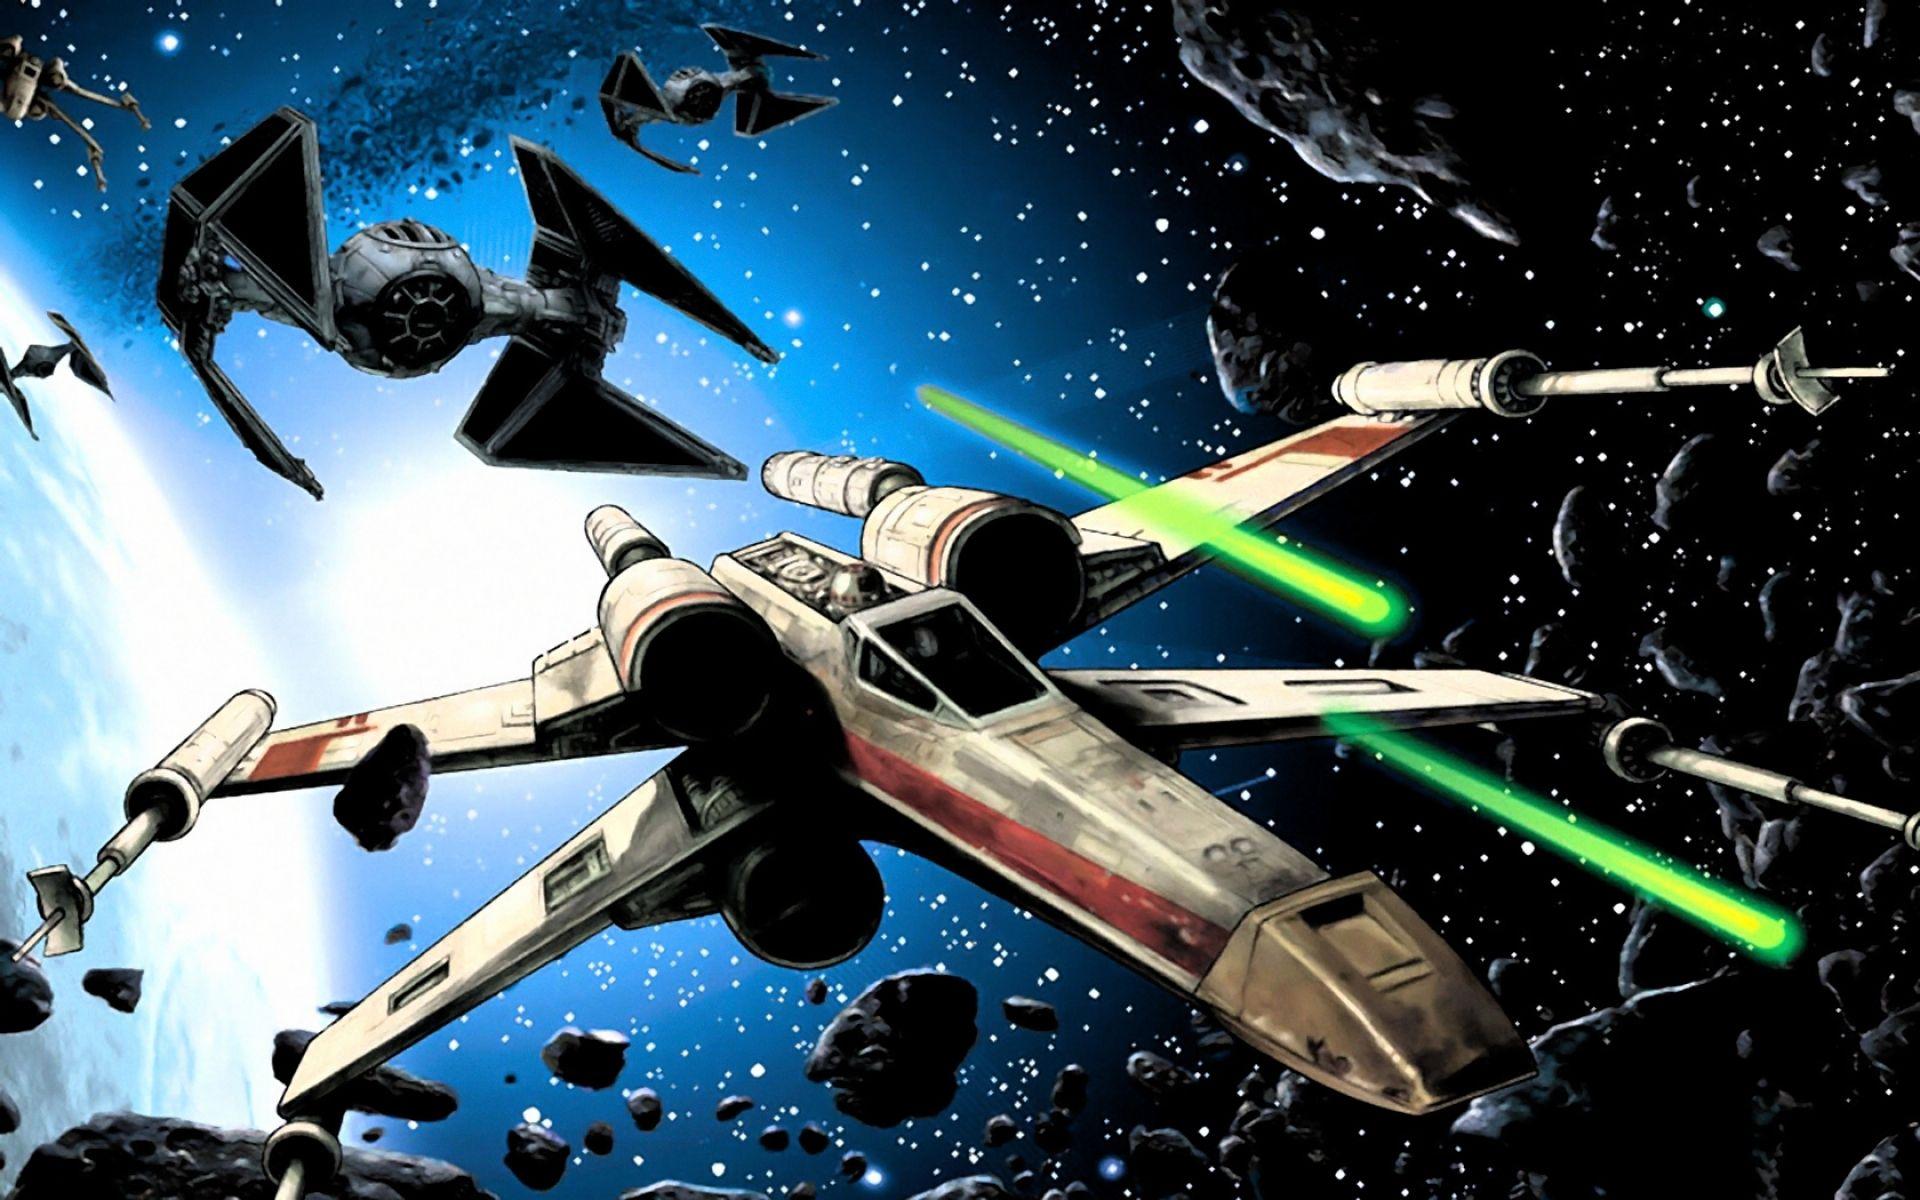 X Wing Vs Tie Fighter 1920x1200 Star Wars Xwing Tie Fighters 1680x1050 Wallpaper Art Hd Star Wars Wallpaper Star Wars Spaceships Star Wars Ships